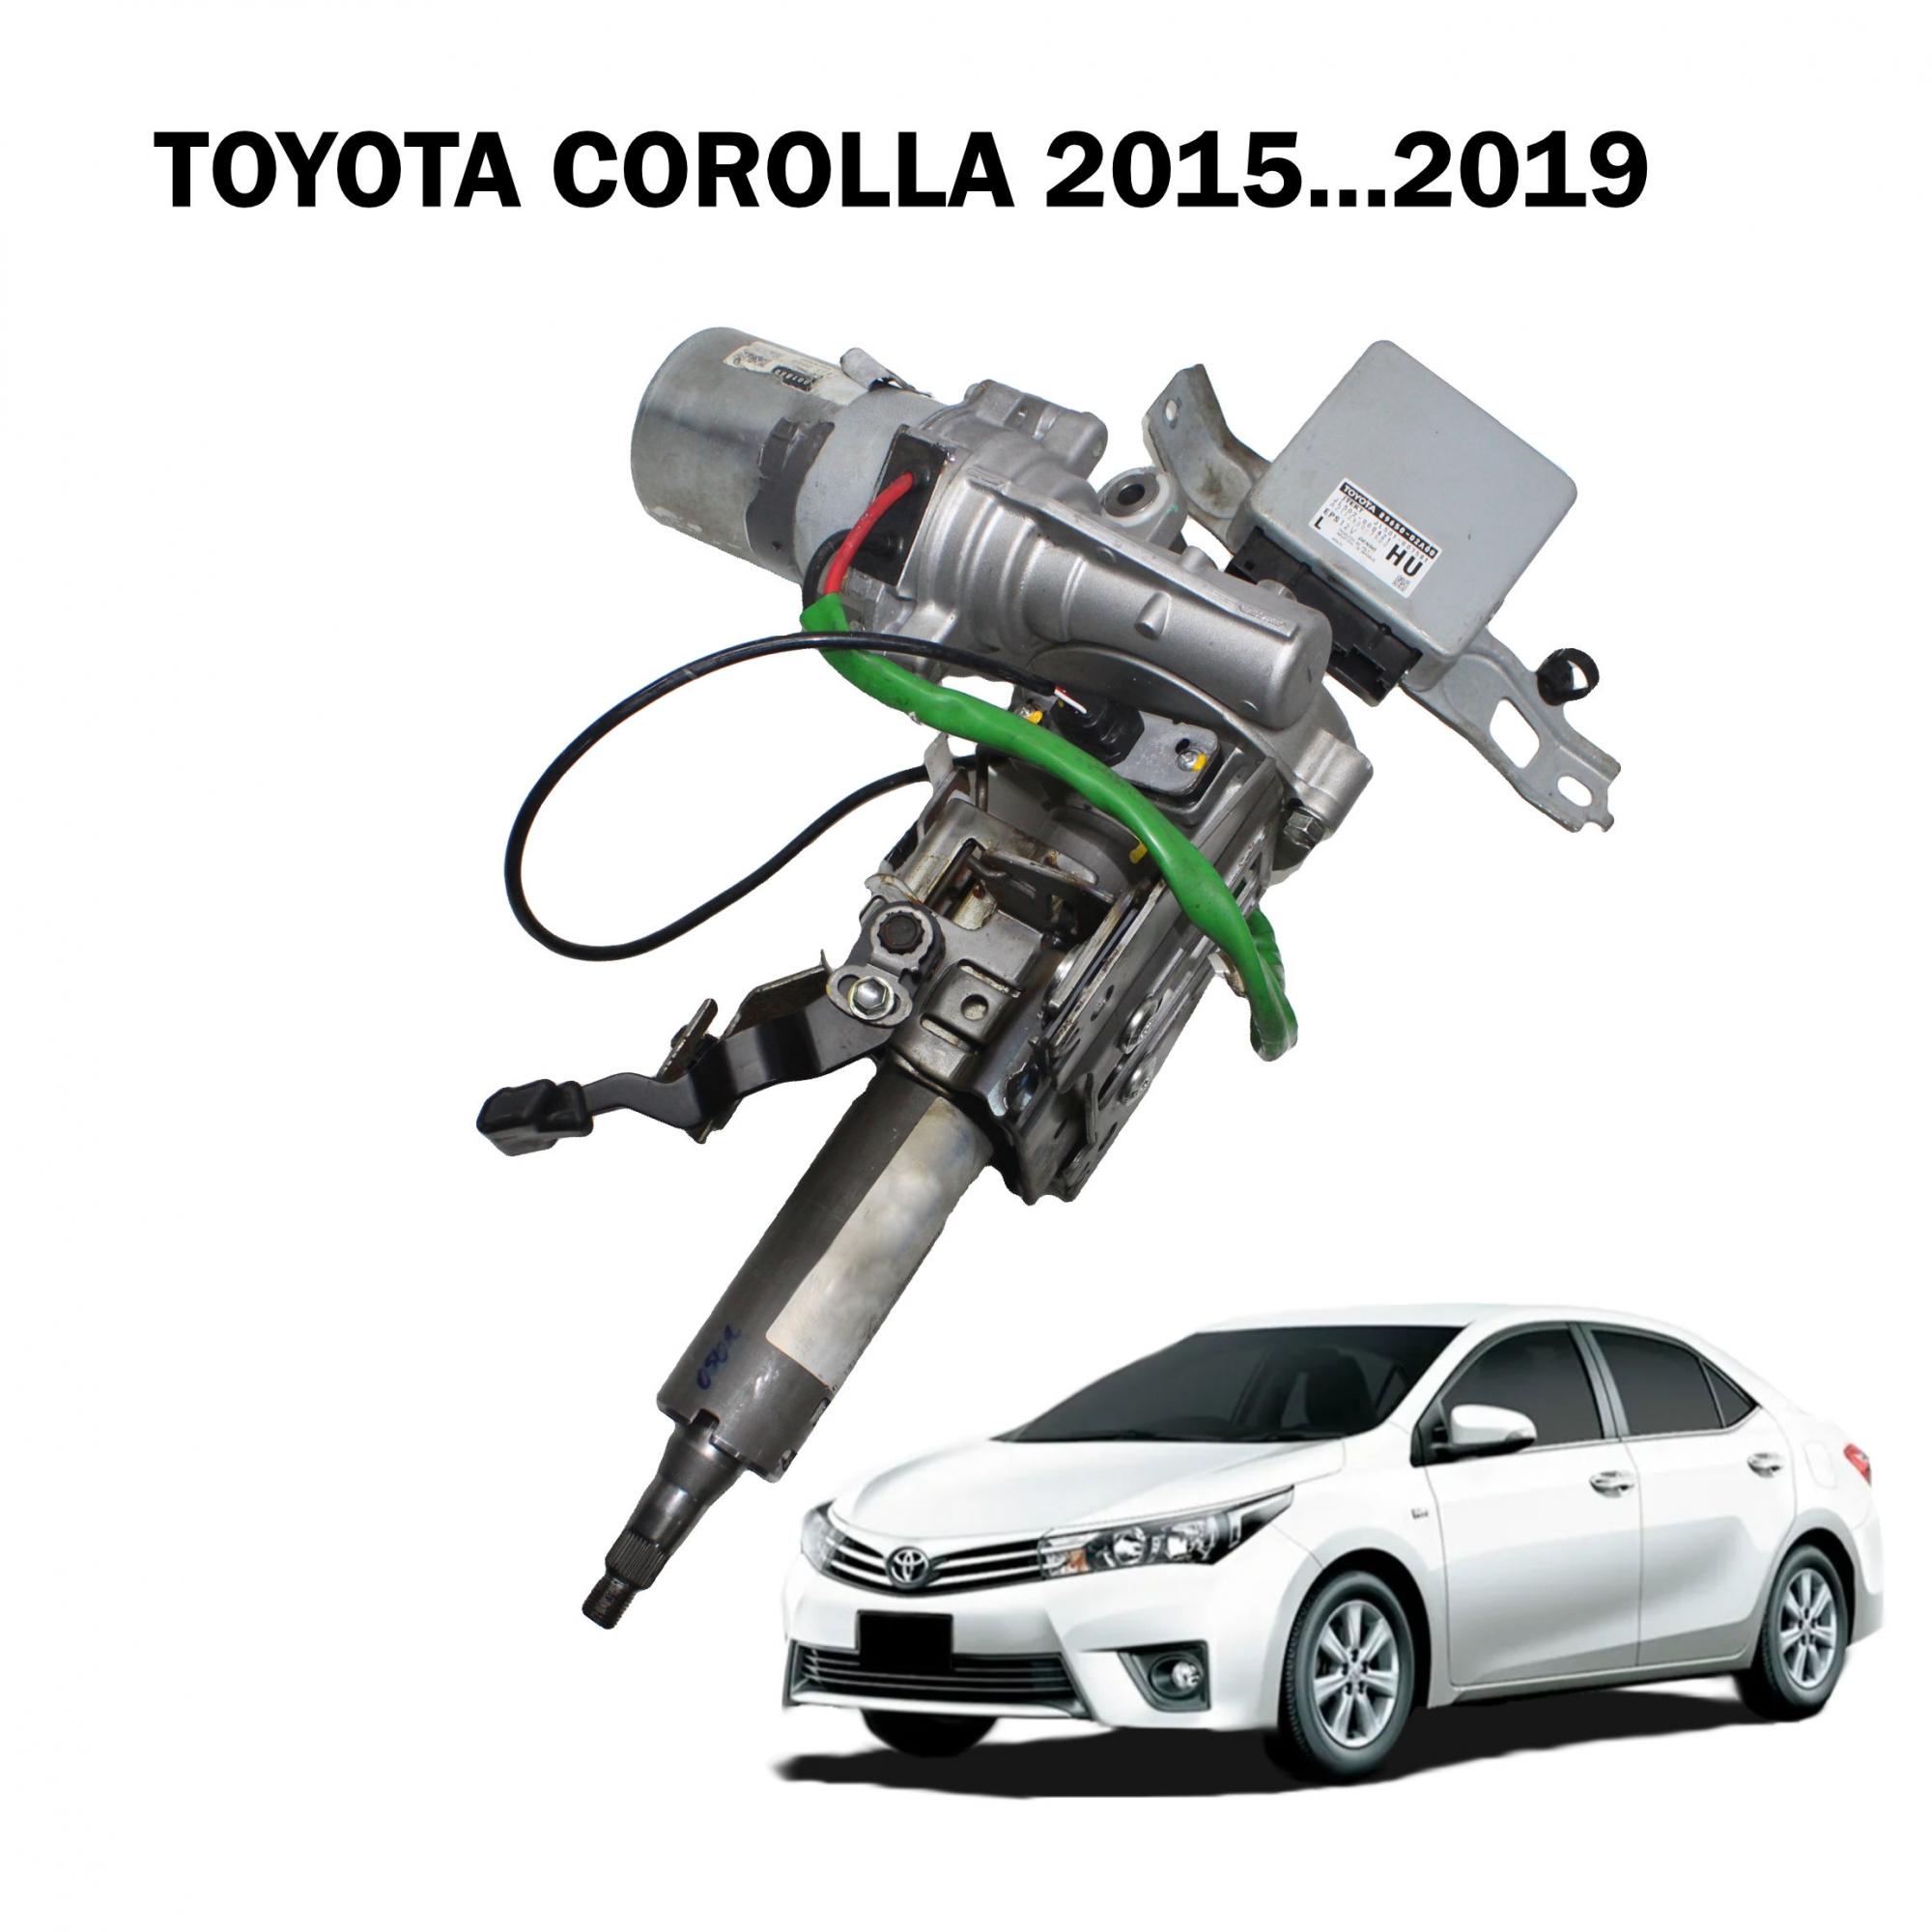 Motor Coluna Direção Elétrica Corolla 15...19 c/ Modulo